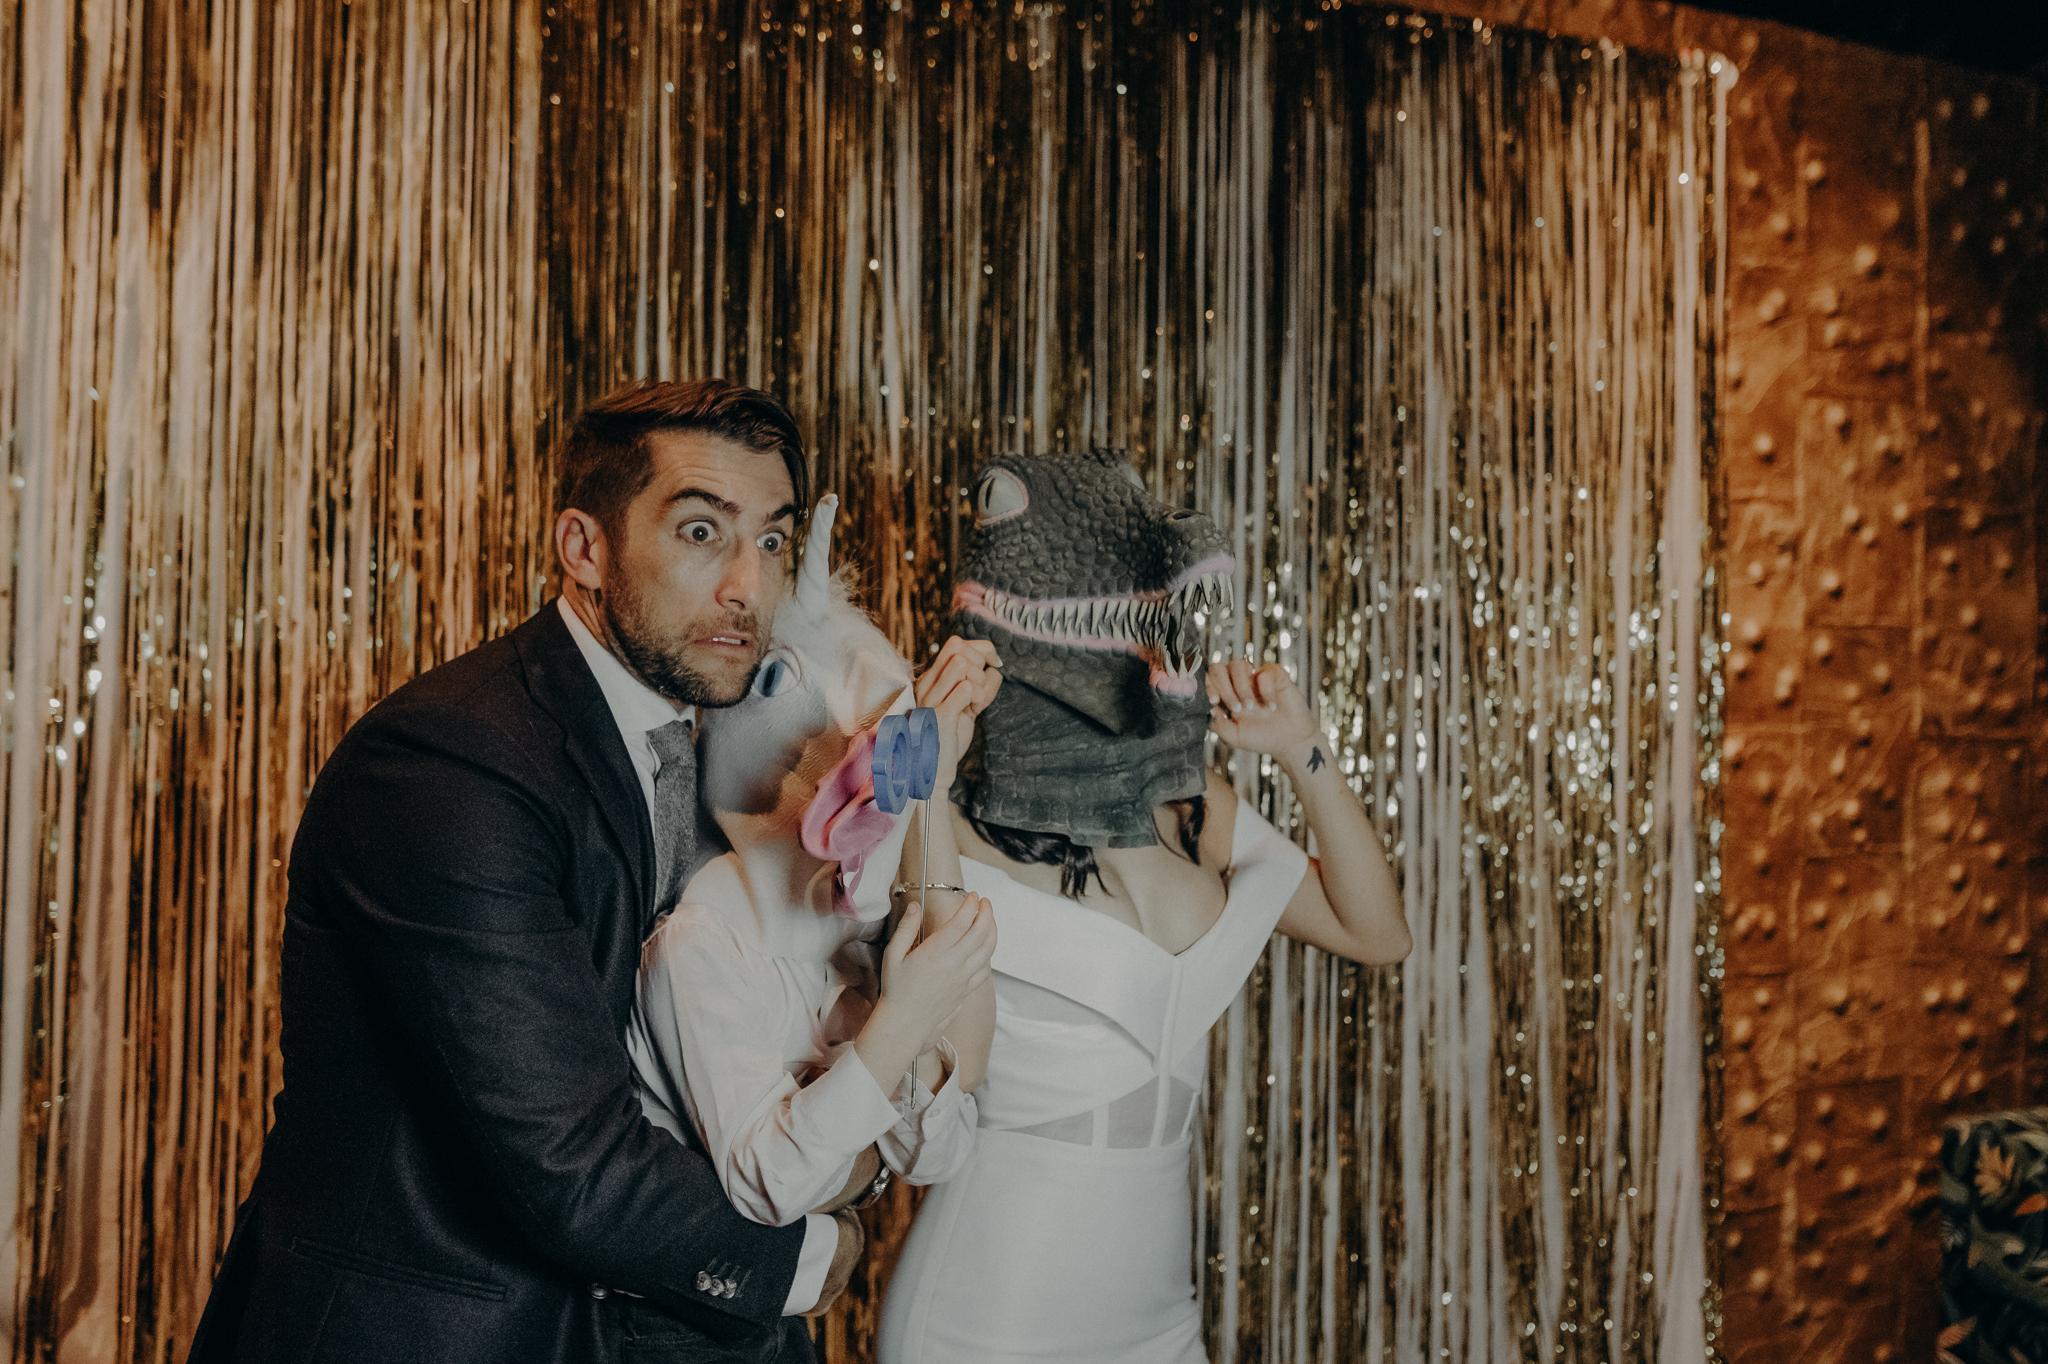 Wedding Photo LA - wedding photographer in los angeles - millwick wedding venue -isaiahandtaylor.com-125.jpg